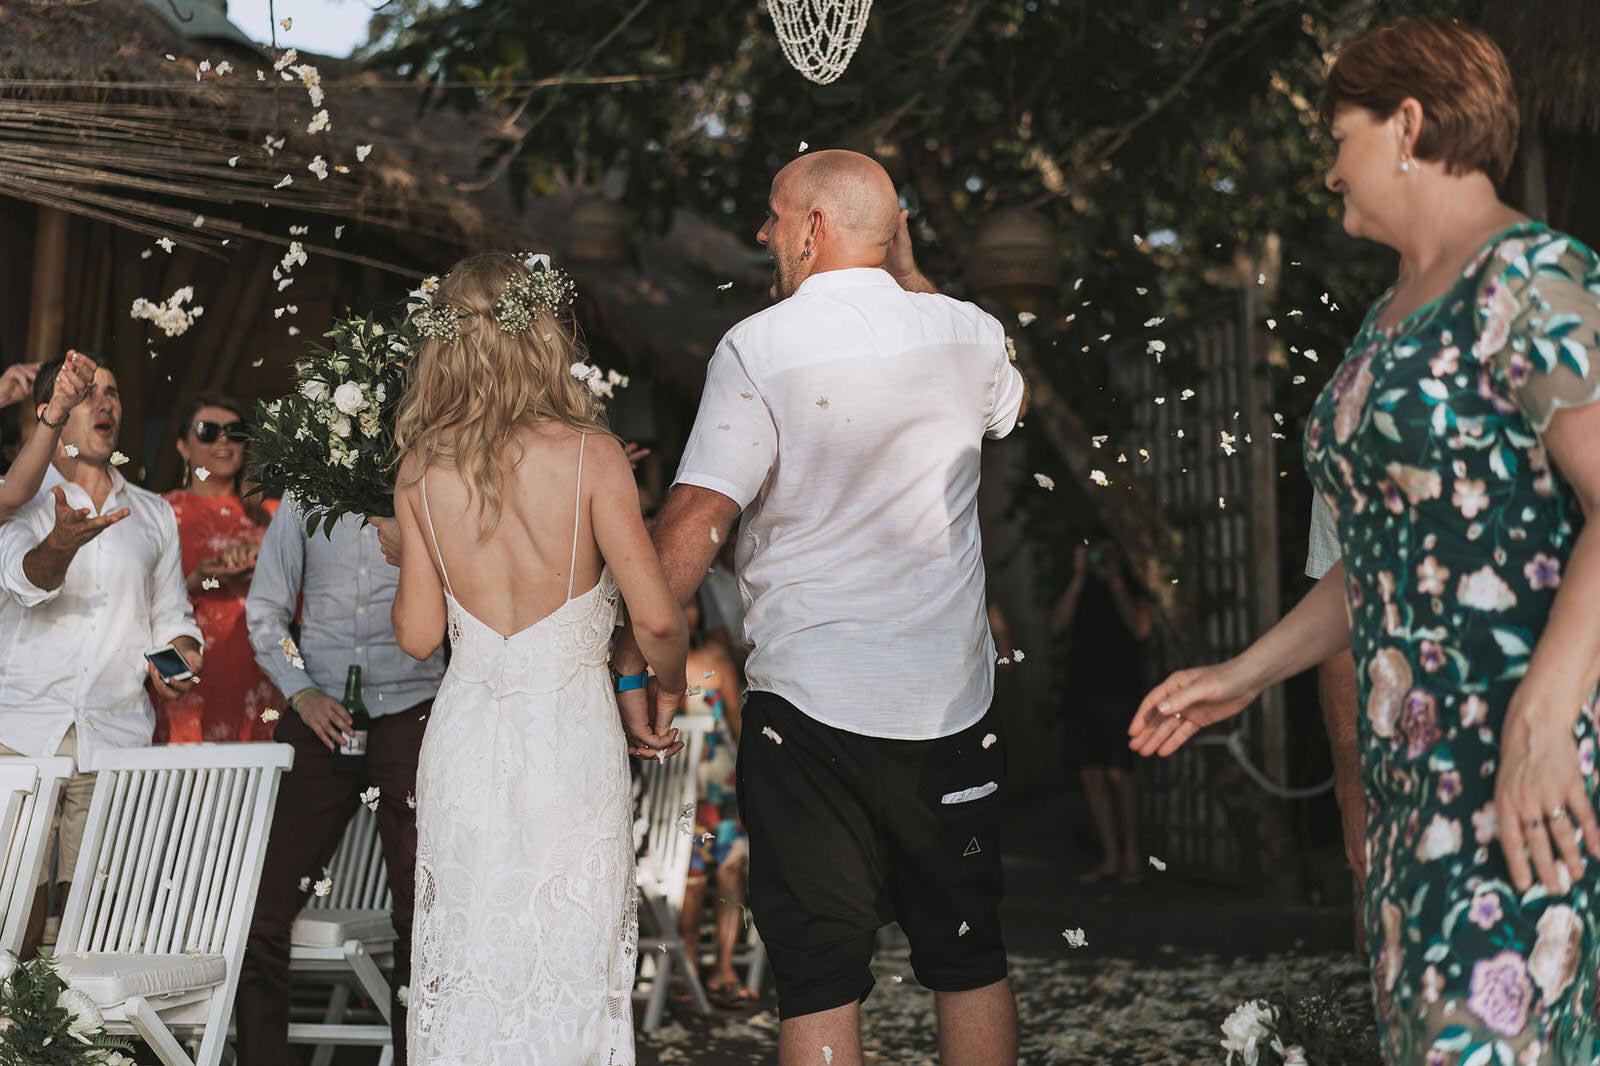 newfound-hai-tide-nusa-lembongan-bali-wedding-photographers-122